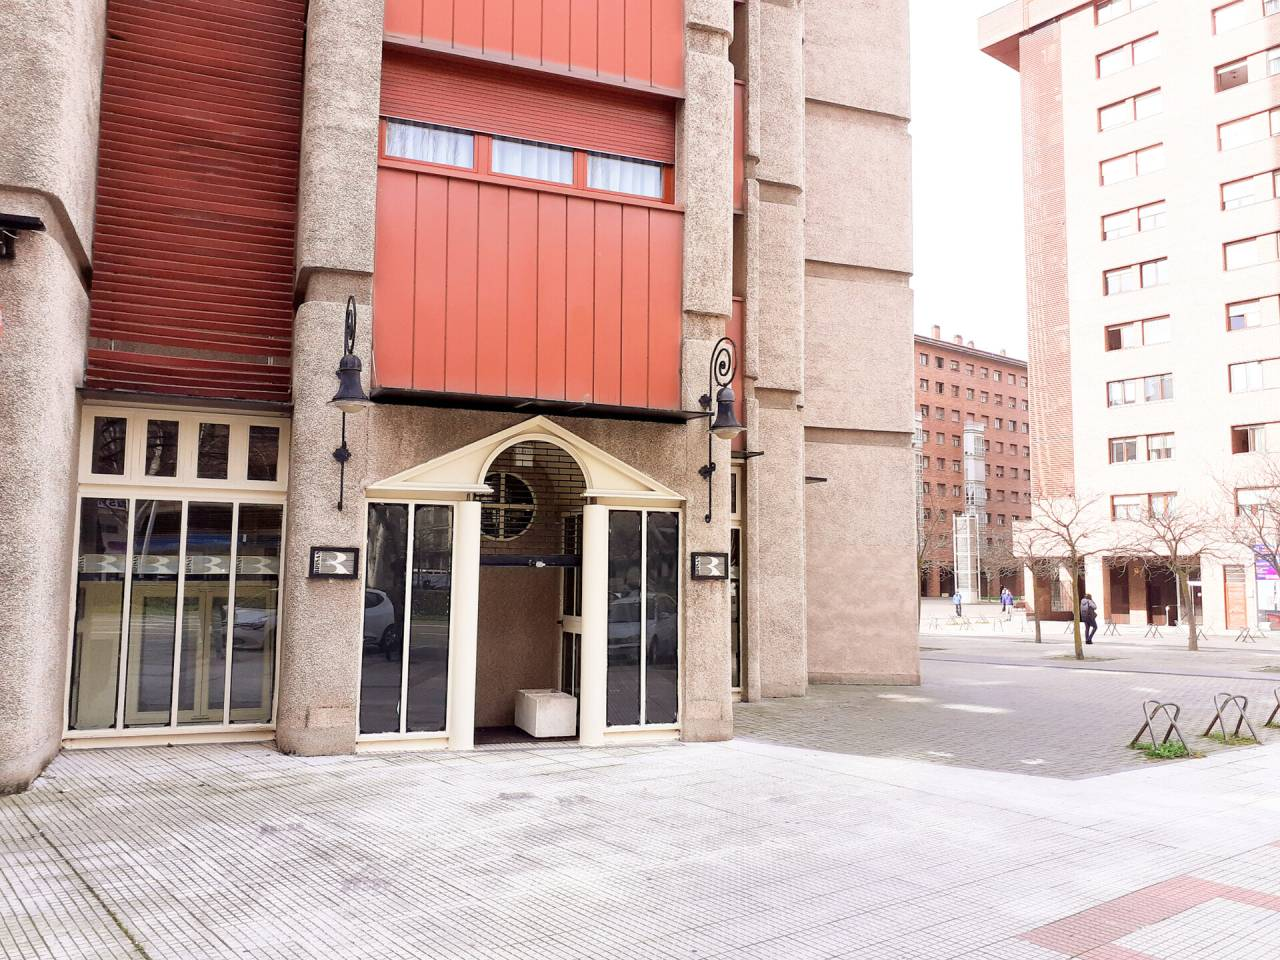 VENTA DE LOCAL EN ITURRAMA-AZPILAGAñA, PAMPLONA – IRUñA | REF. (004392)